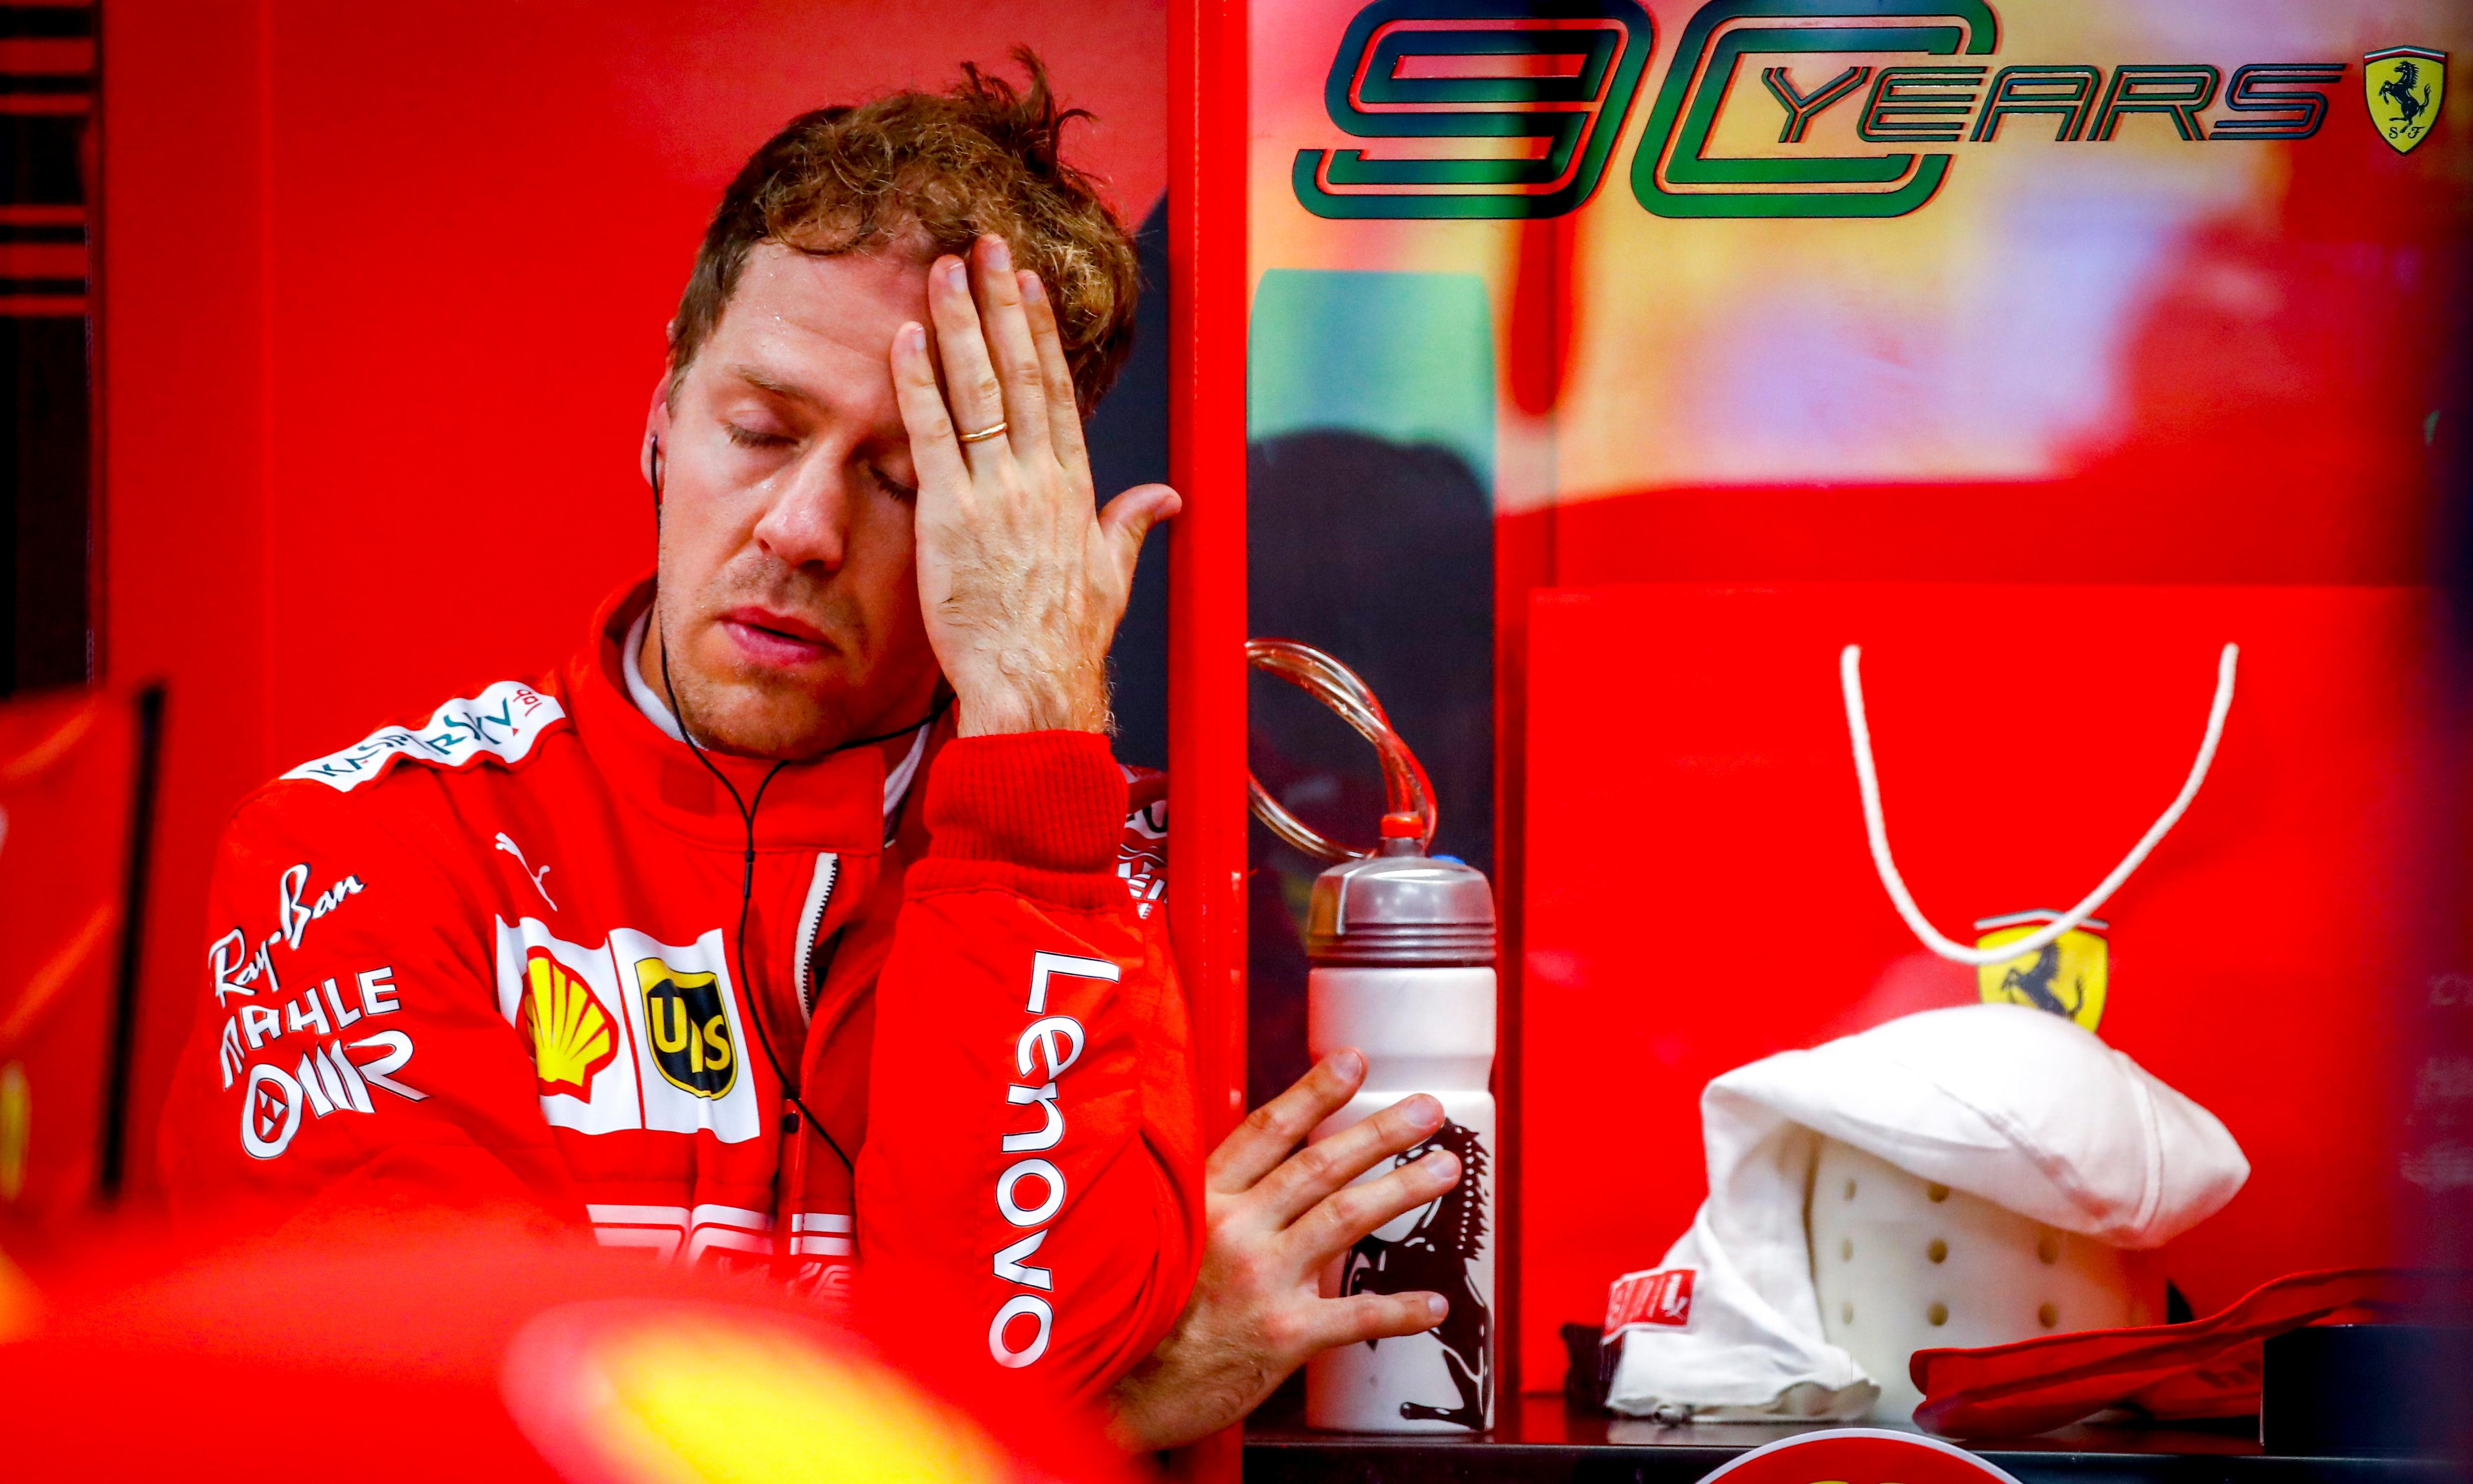 Sebastian Vettel adjusting to lower expectations at Singapore GP